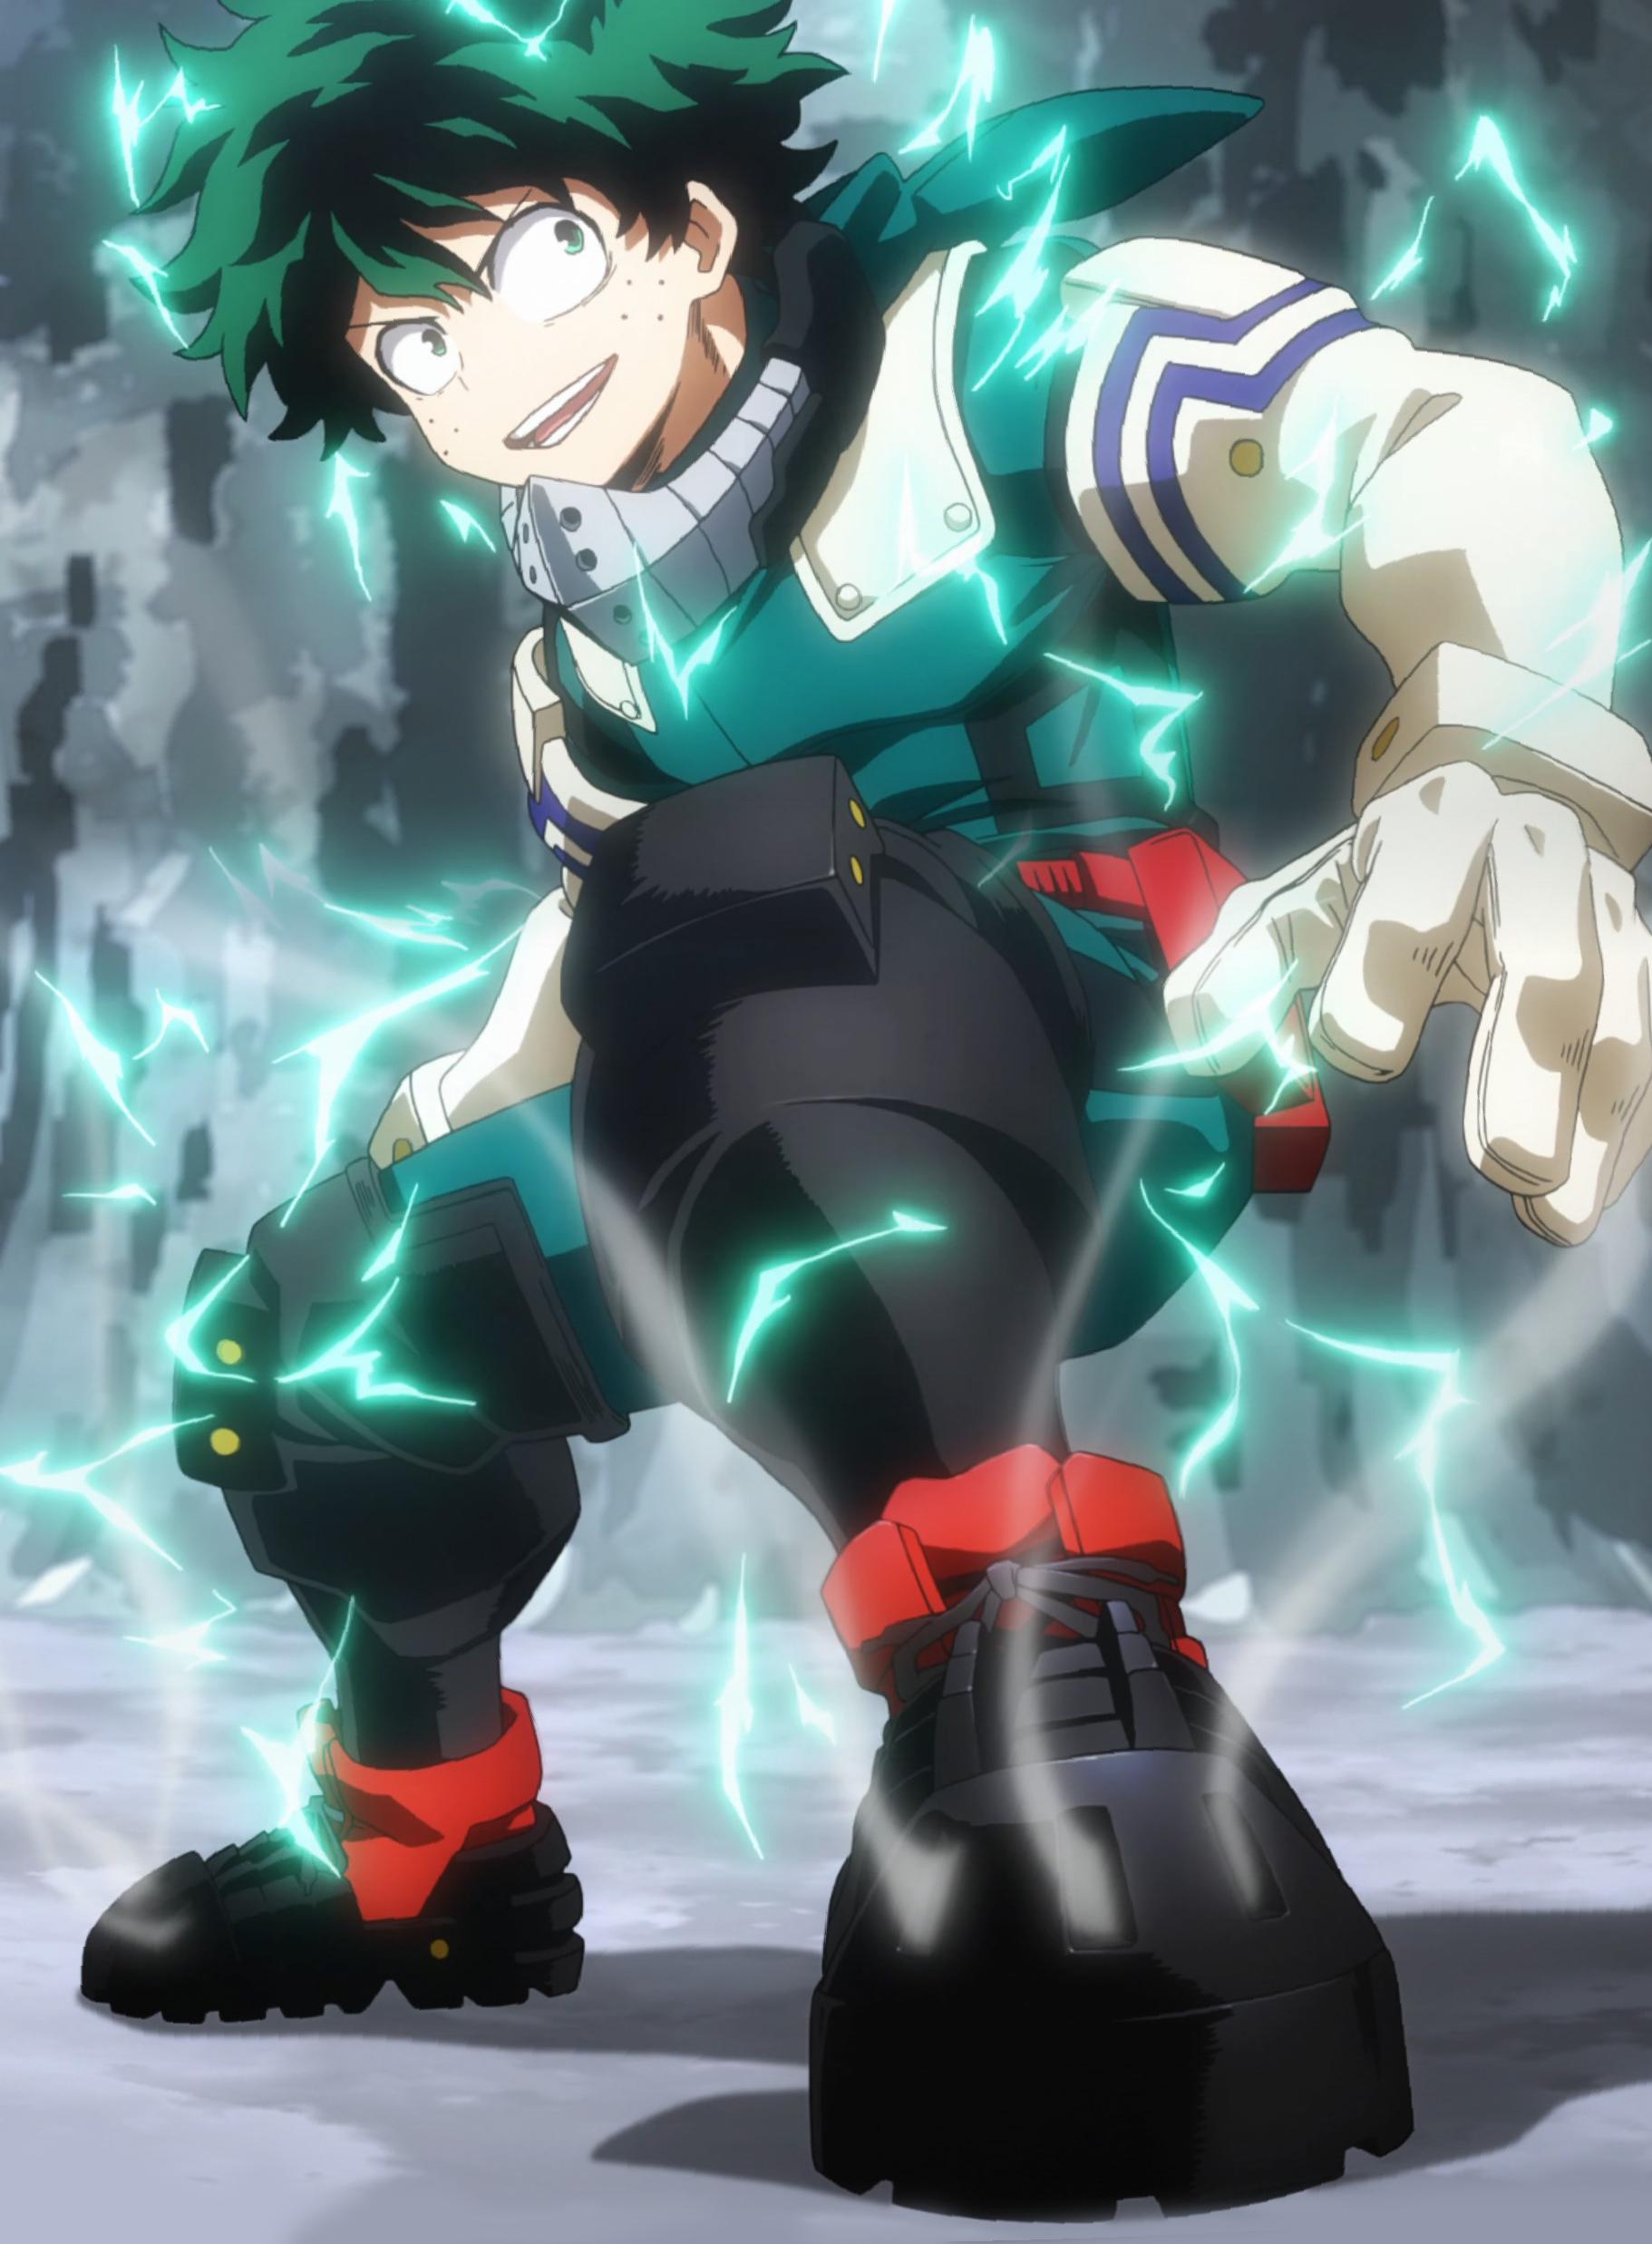 Deku (my hero academia) VS rex salazar (generator rex